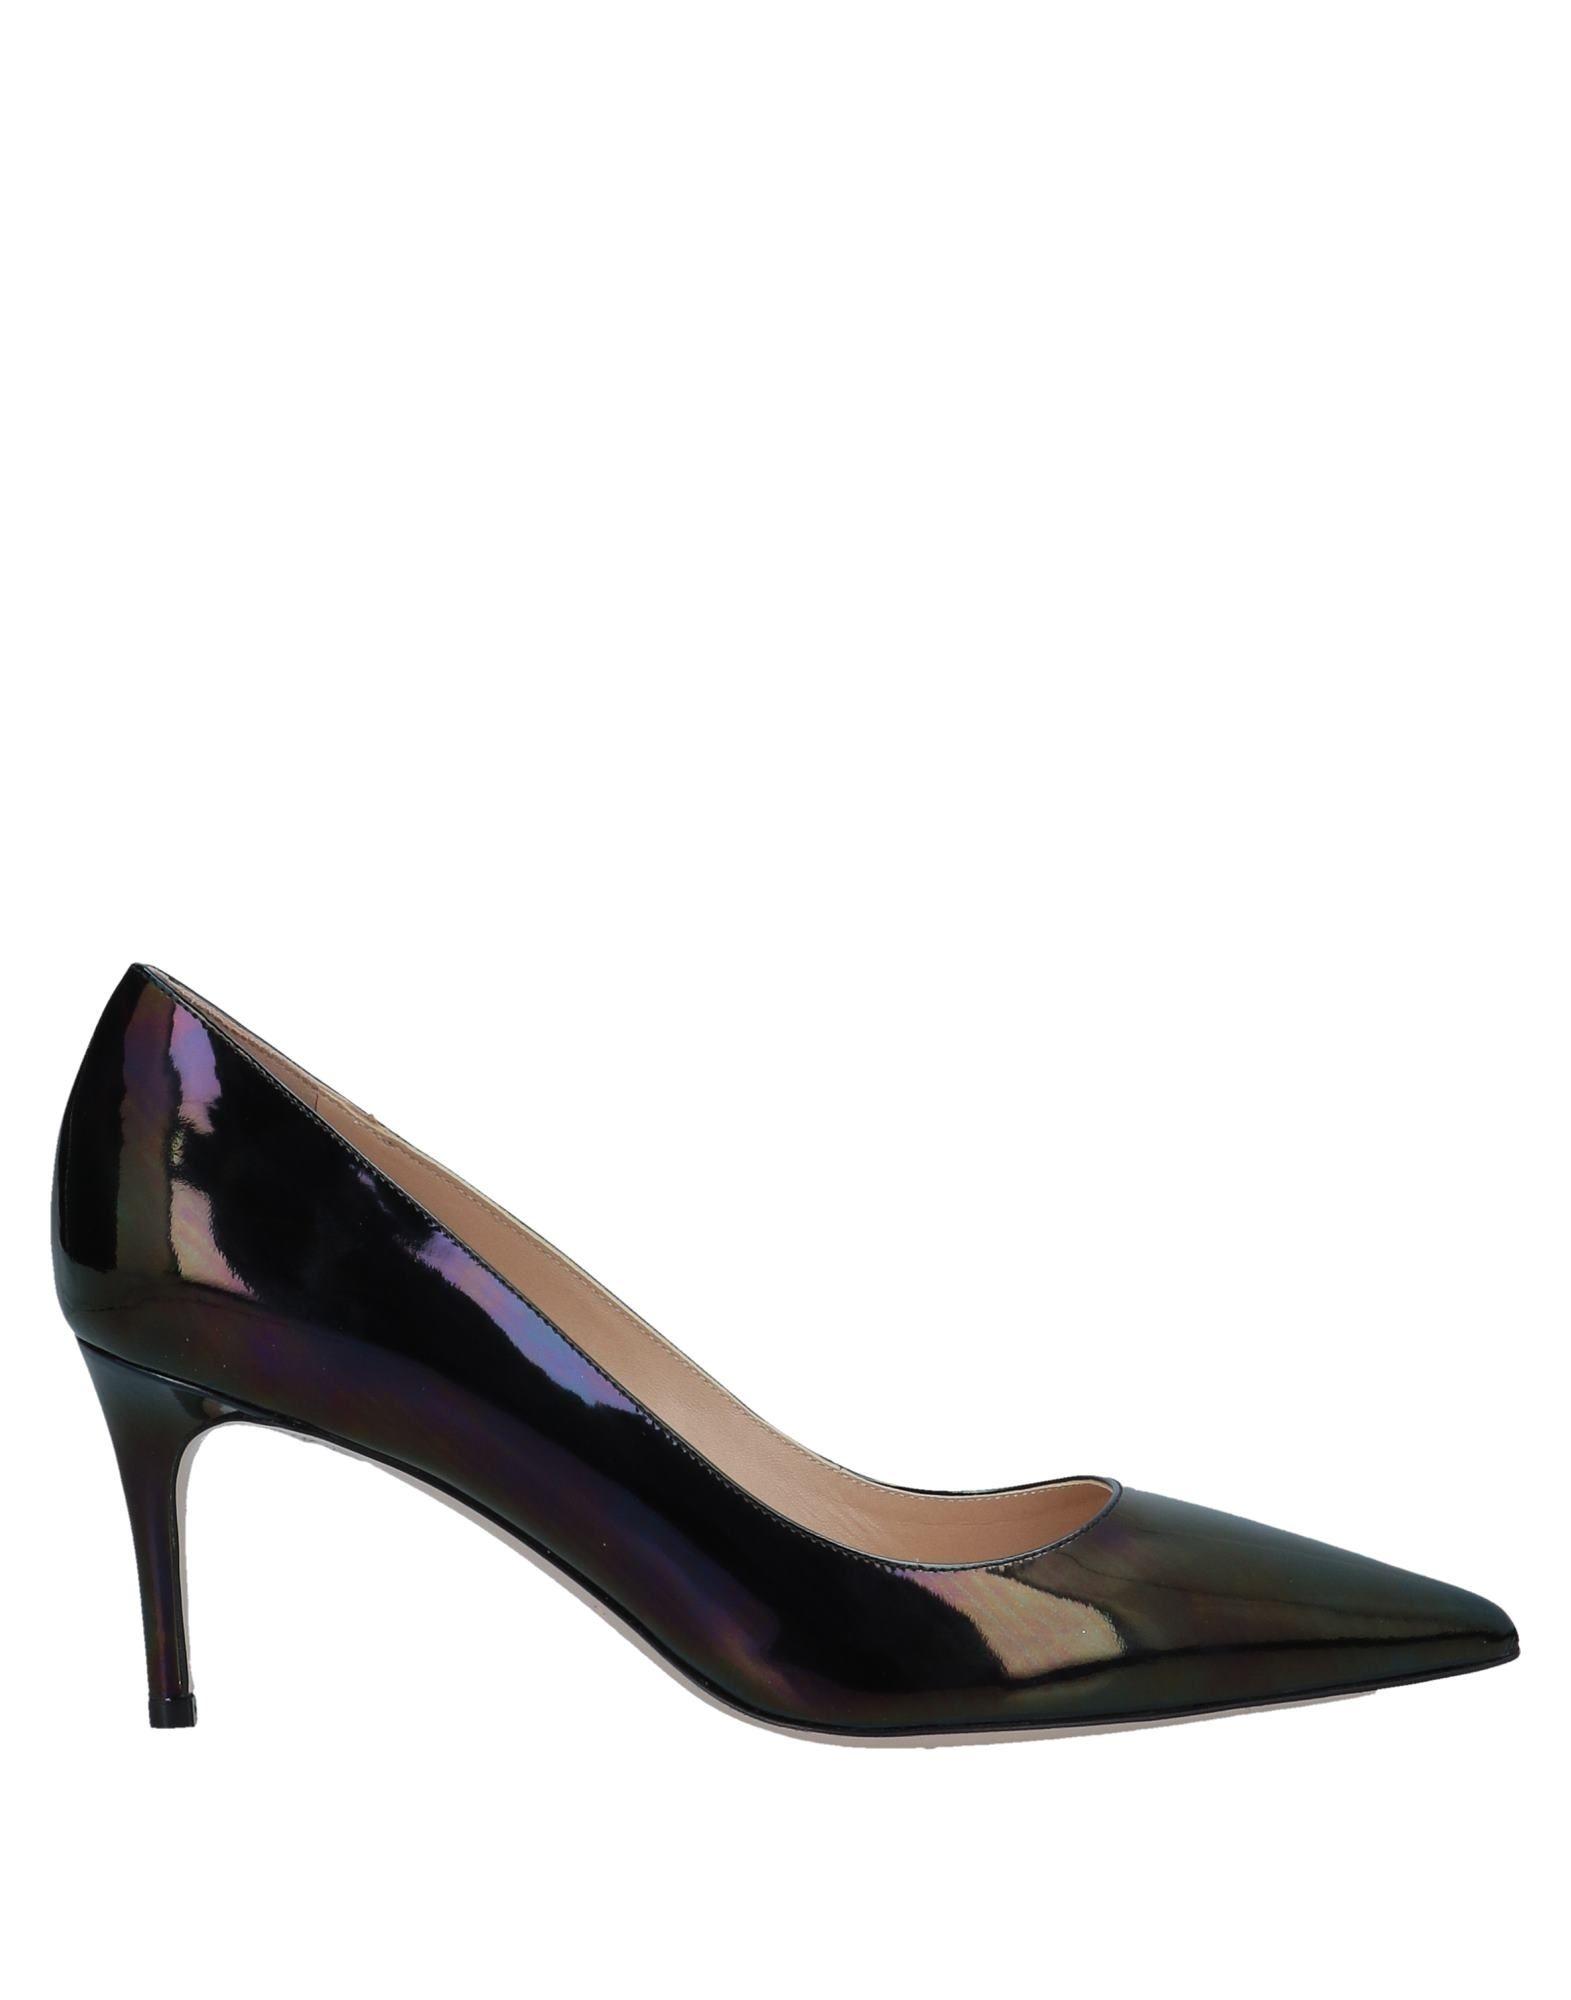 Mocassino Cuoieria offerte Donna - 11482697BE Nuove offerte Cuoieria e scarpe comode 694082